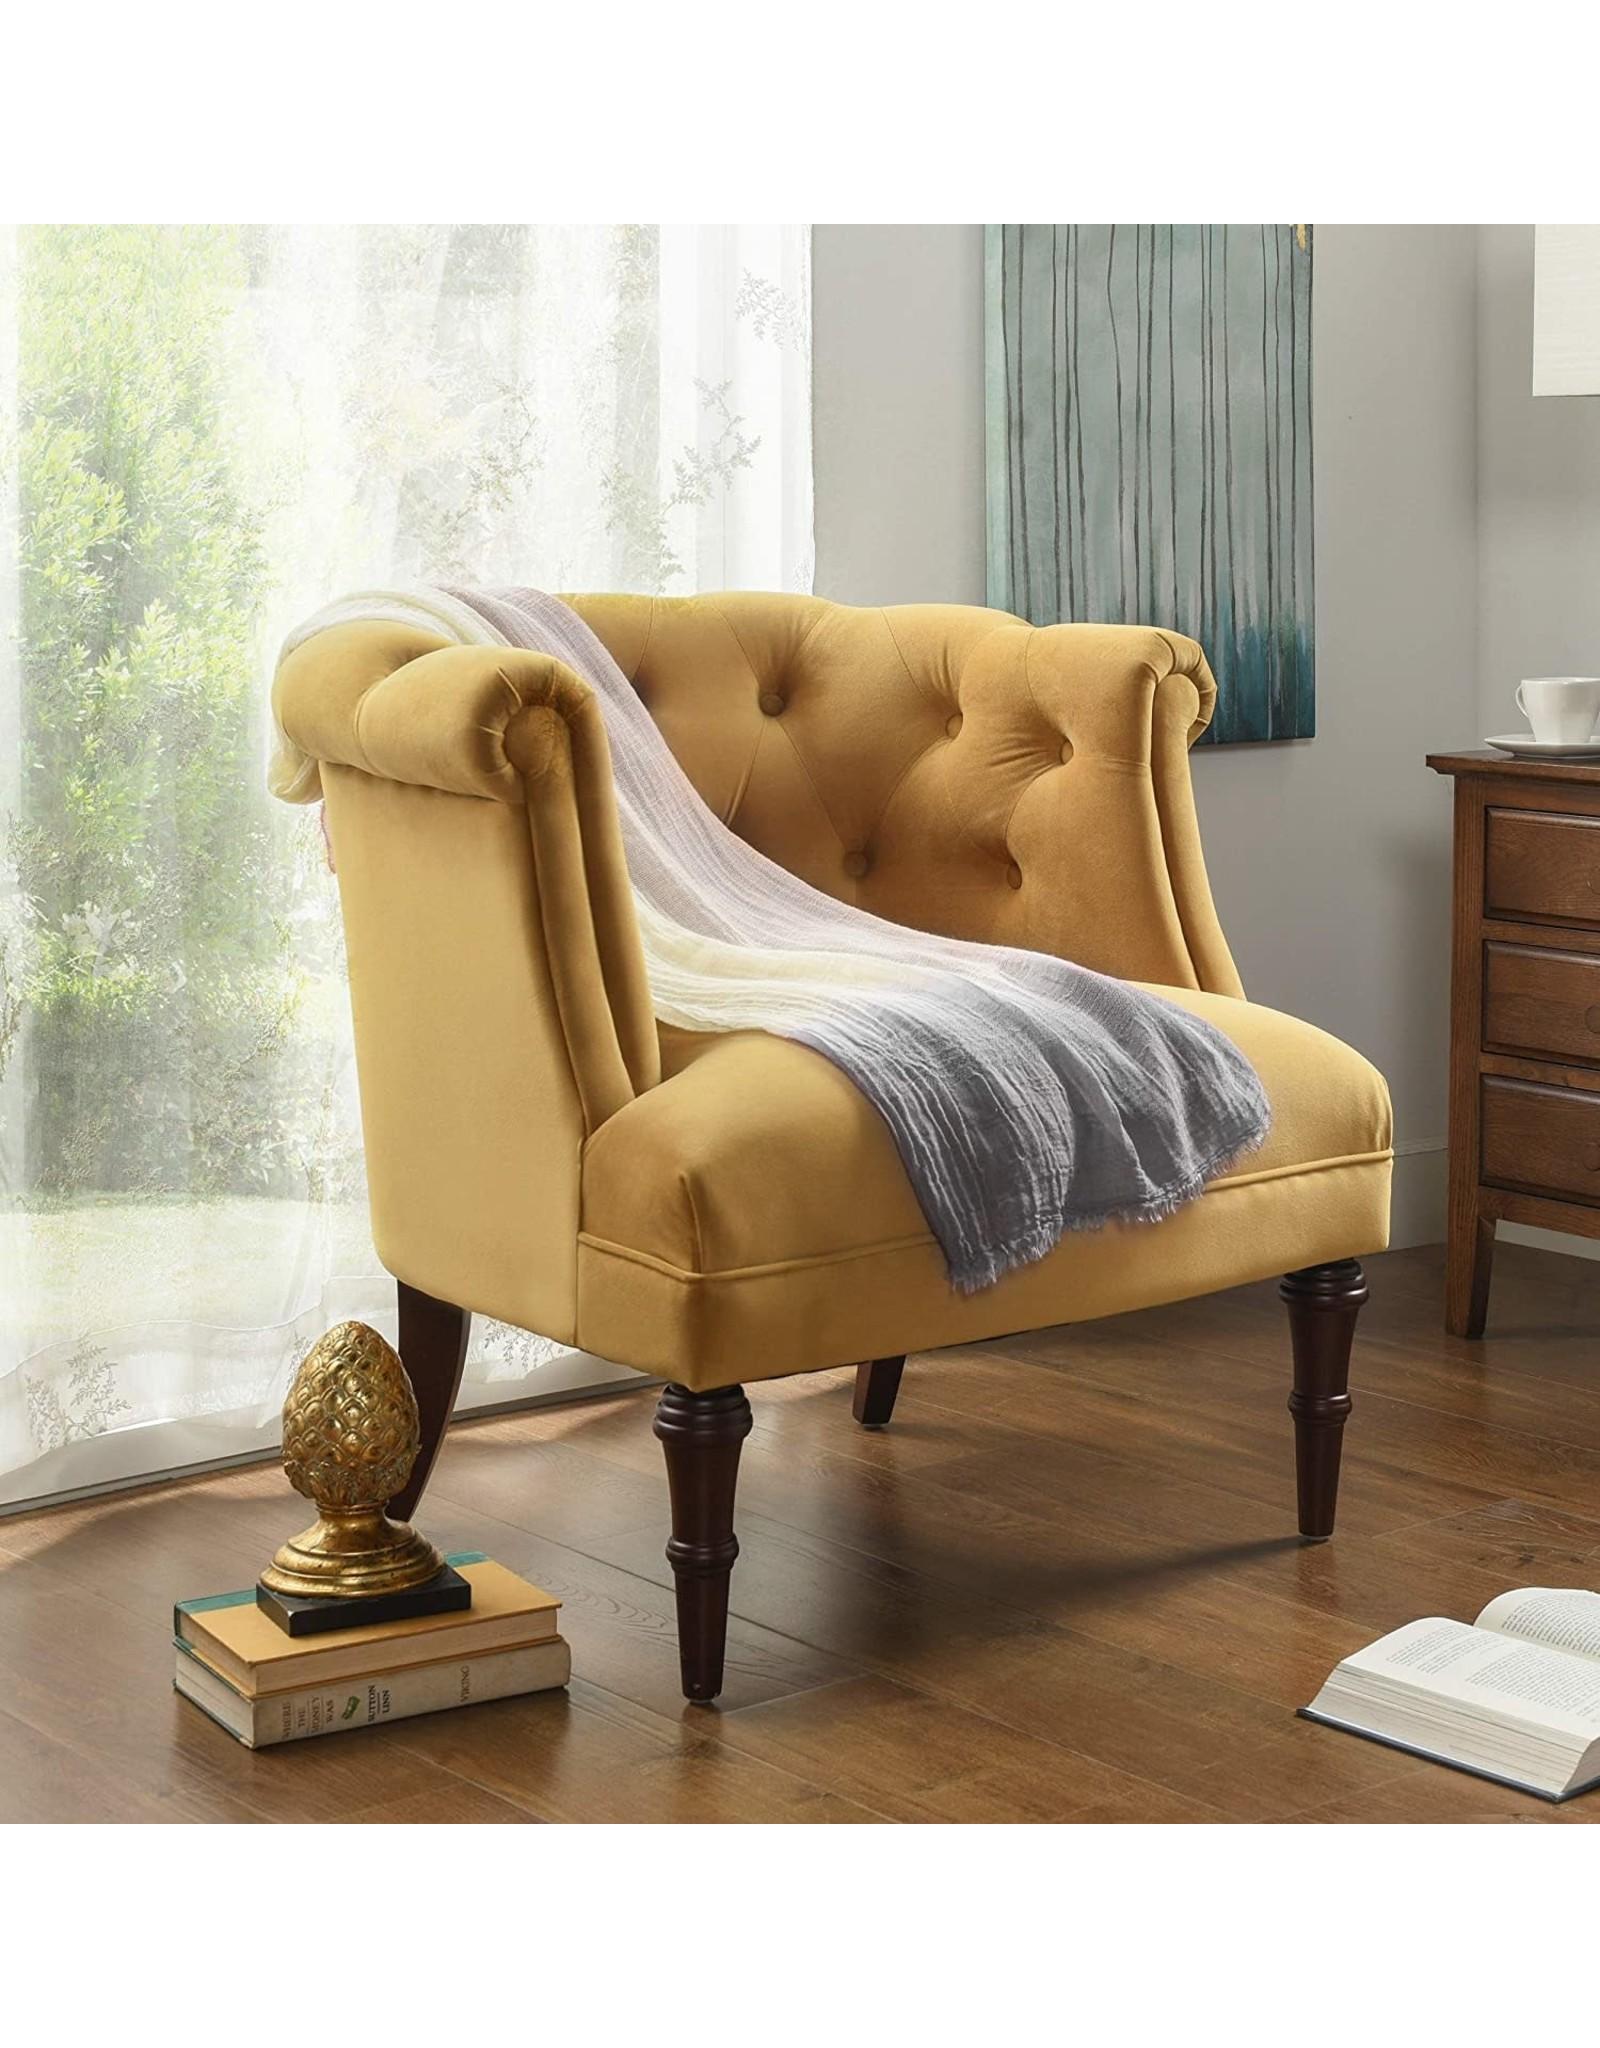 Jennifer Taylor Jennifer Taylor Katherine Tufted Accent Chair, Large, Gold